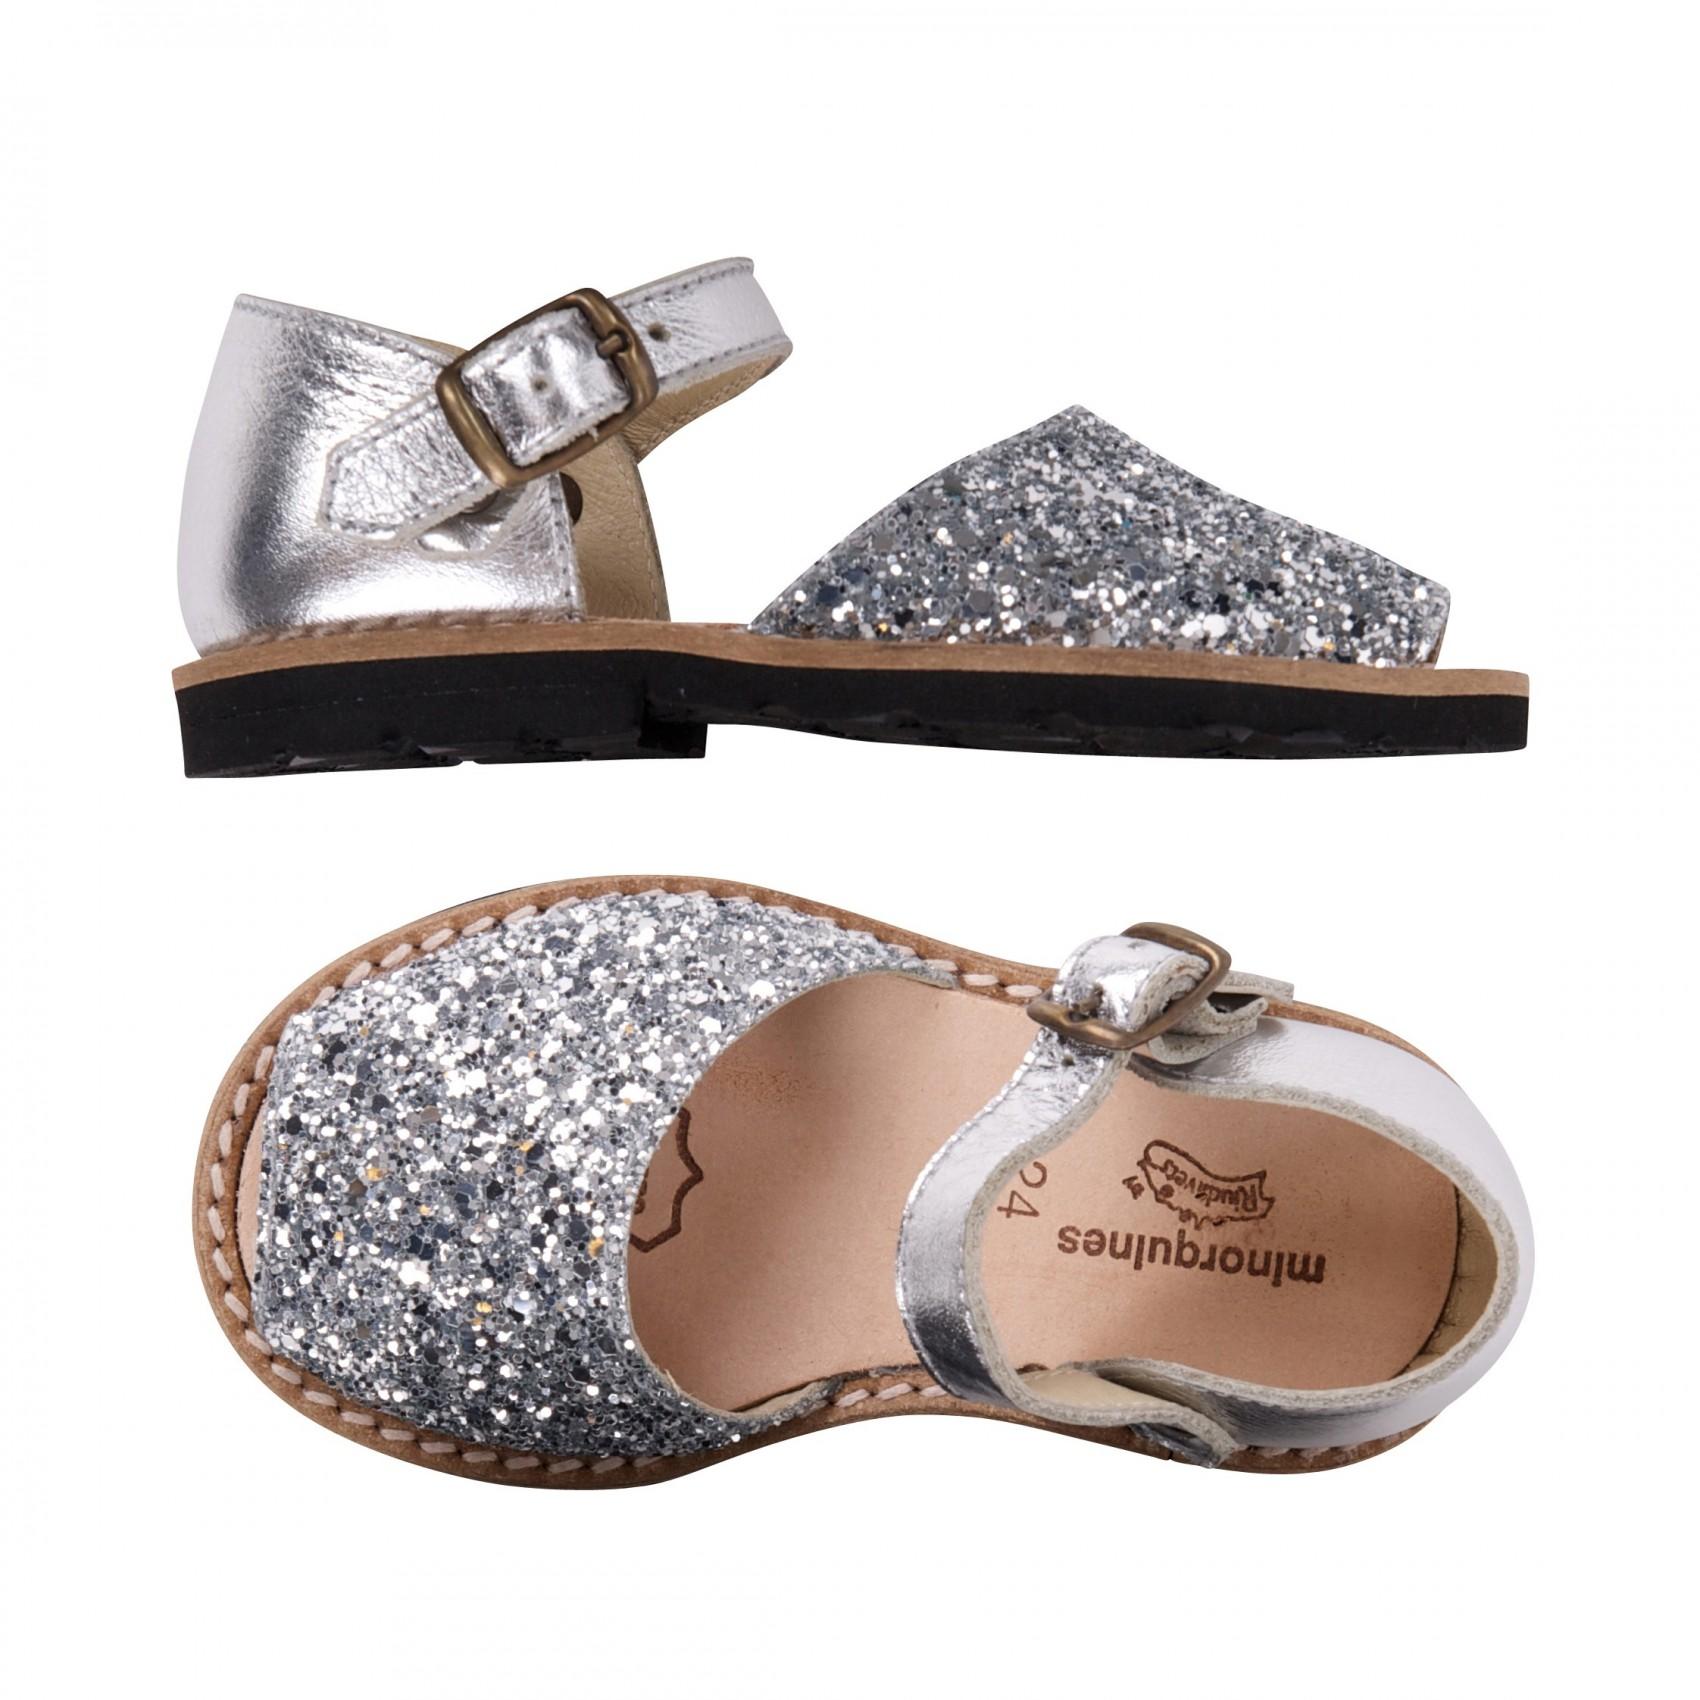 Chaussures Minorquines 30 argentées enfant PHKI60m